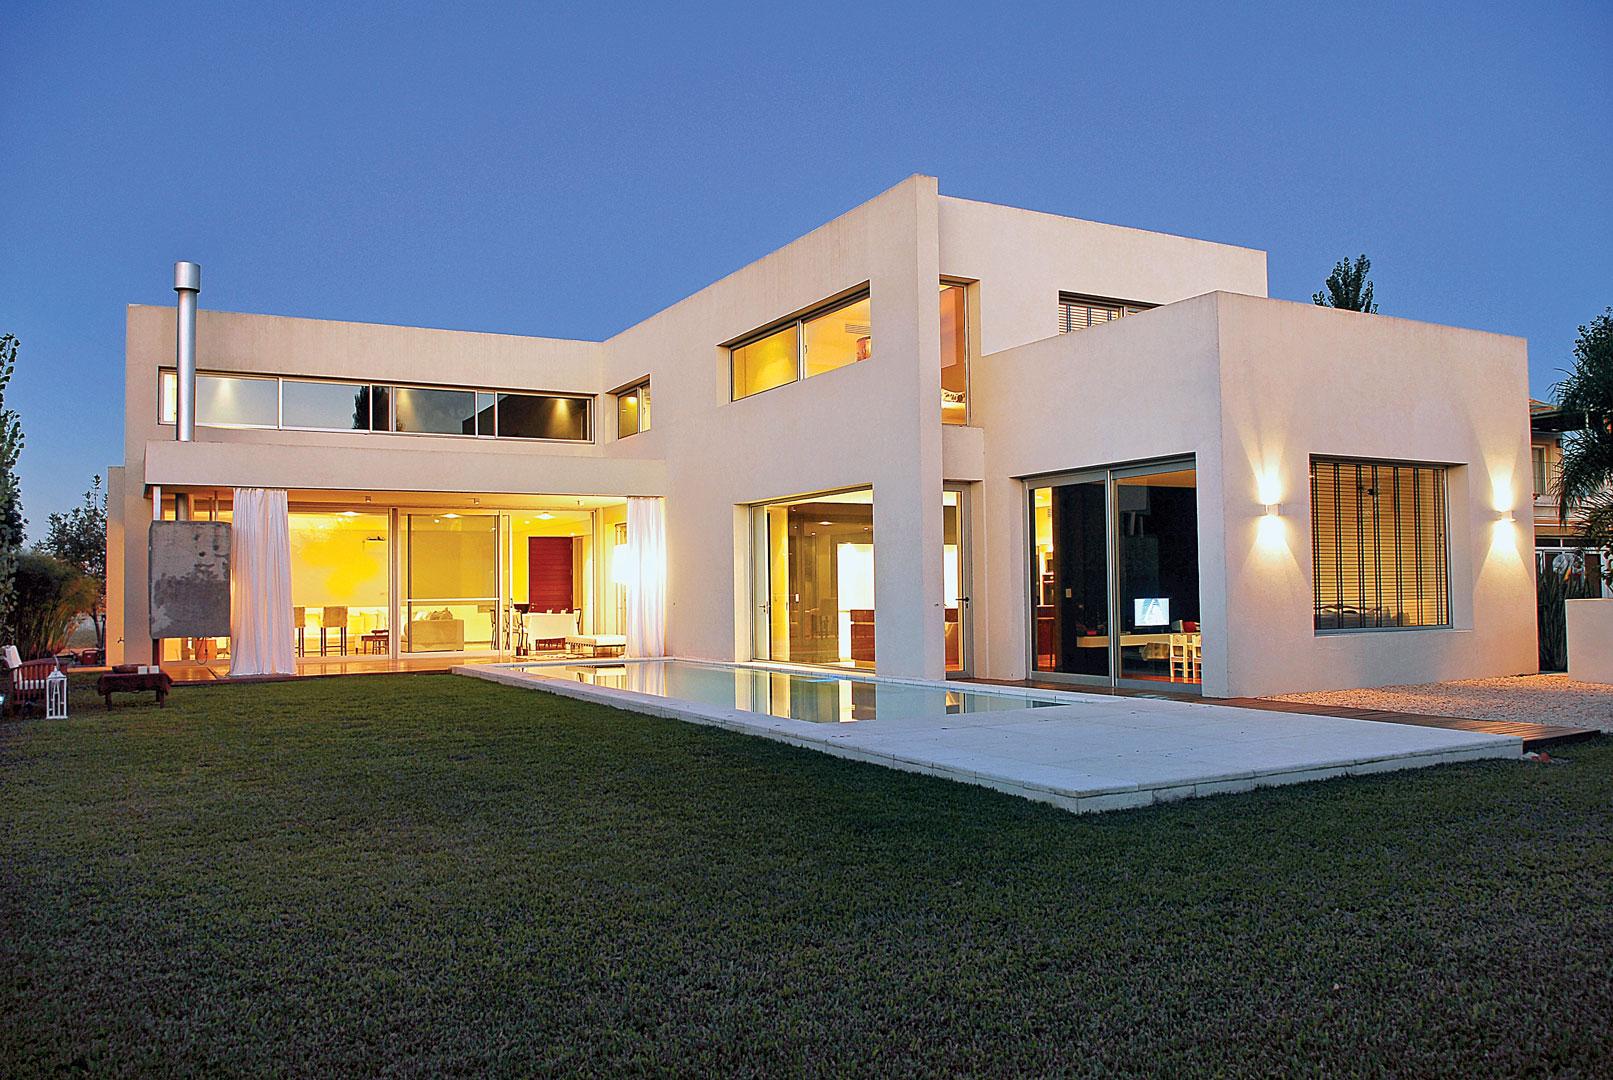 id estudio de arquitectura casa estilo actual